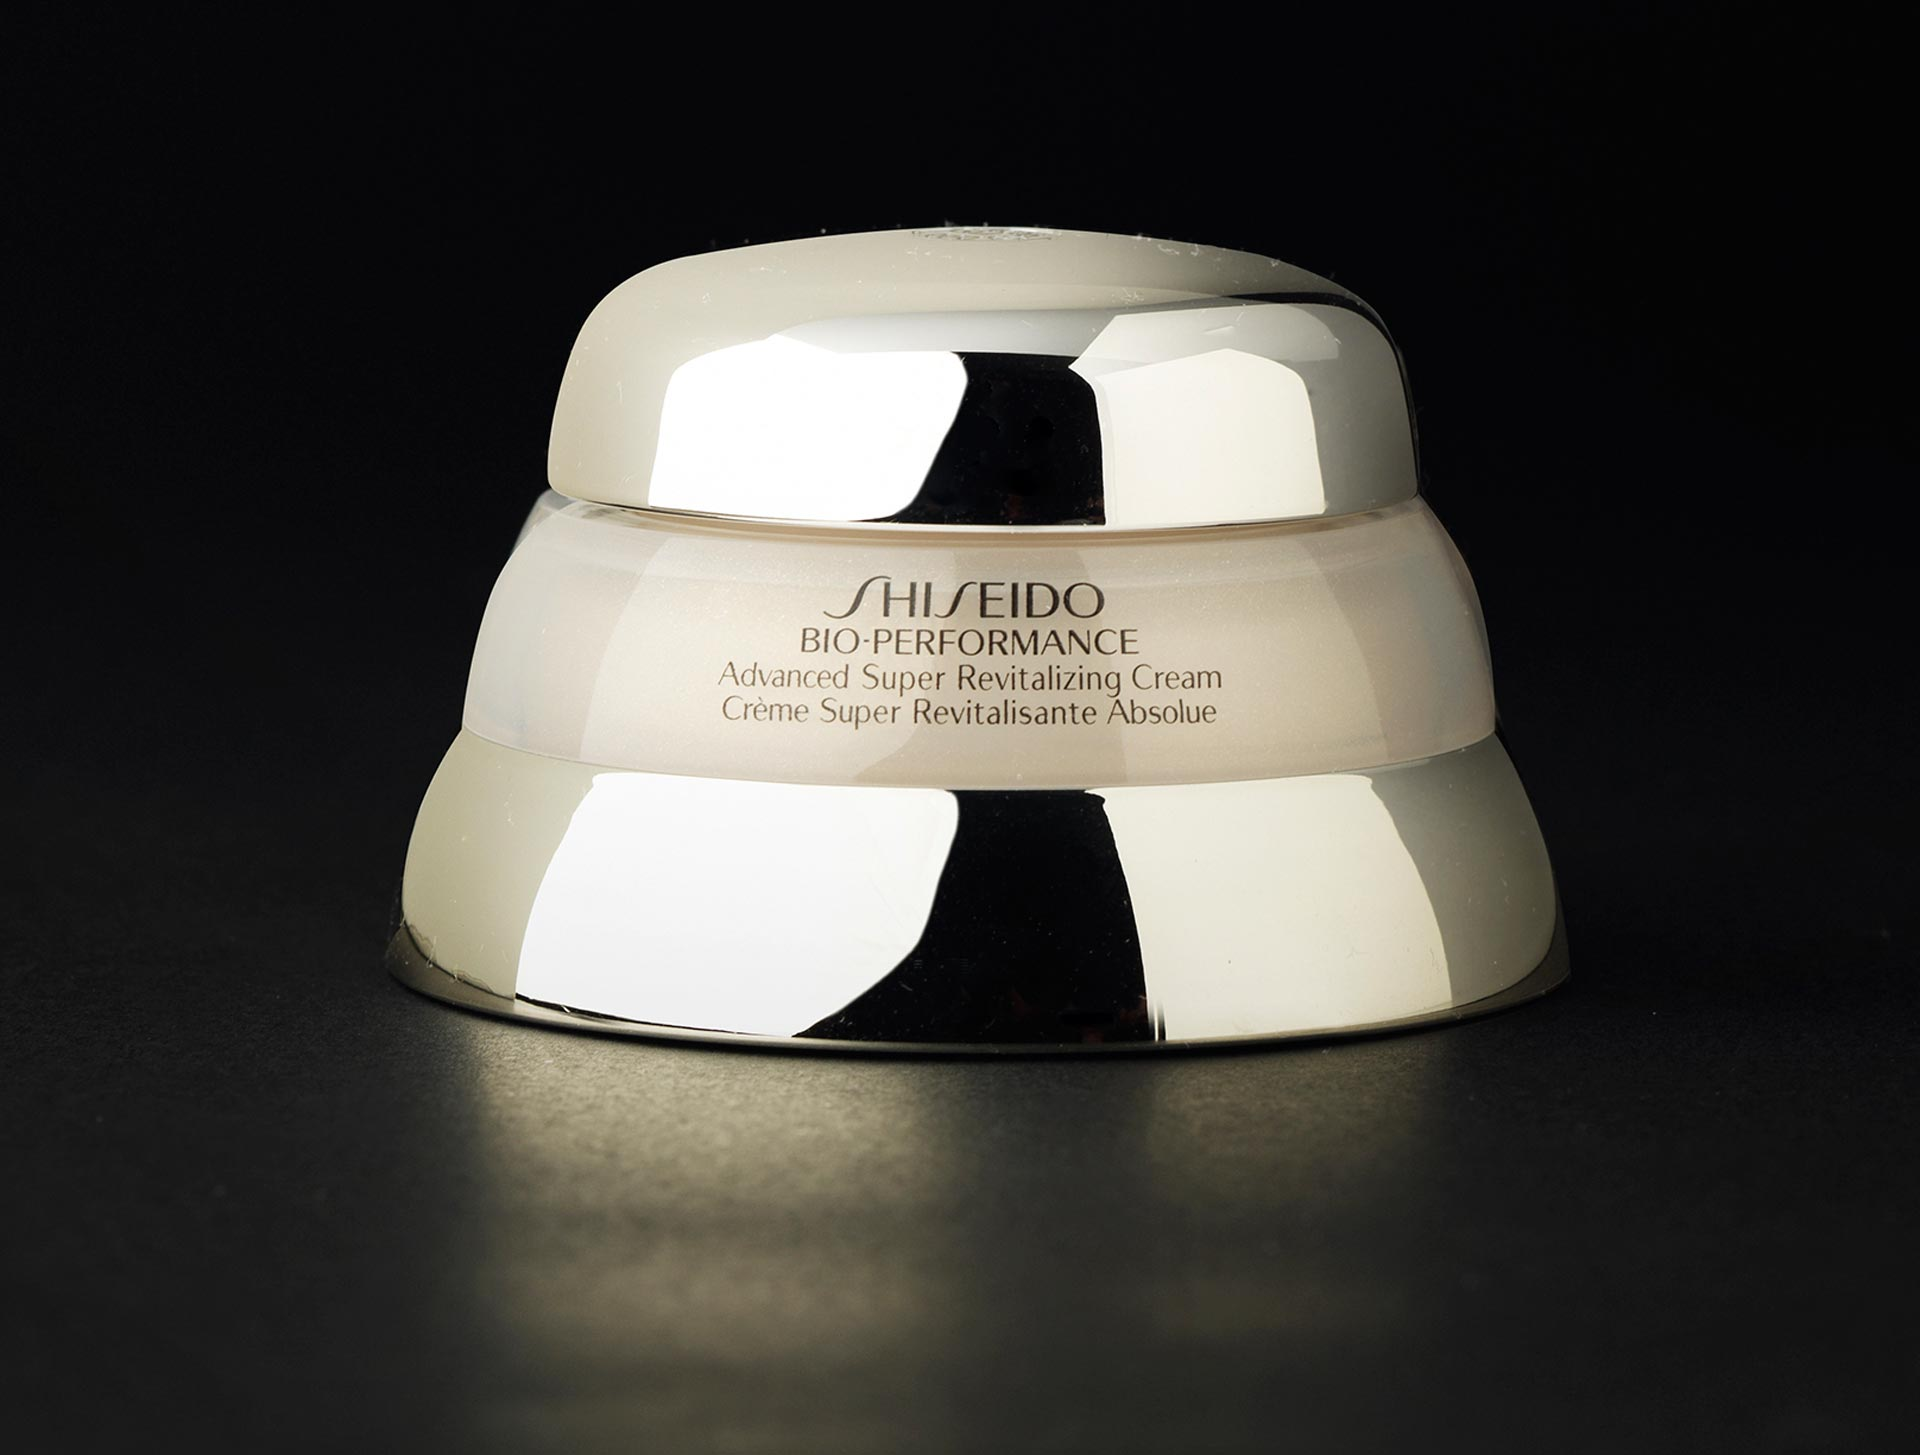 Shiseido-Bio-Performance-Advanced-Super-Revitalizer-Cream